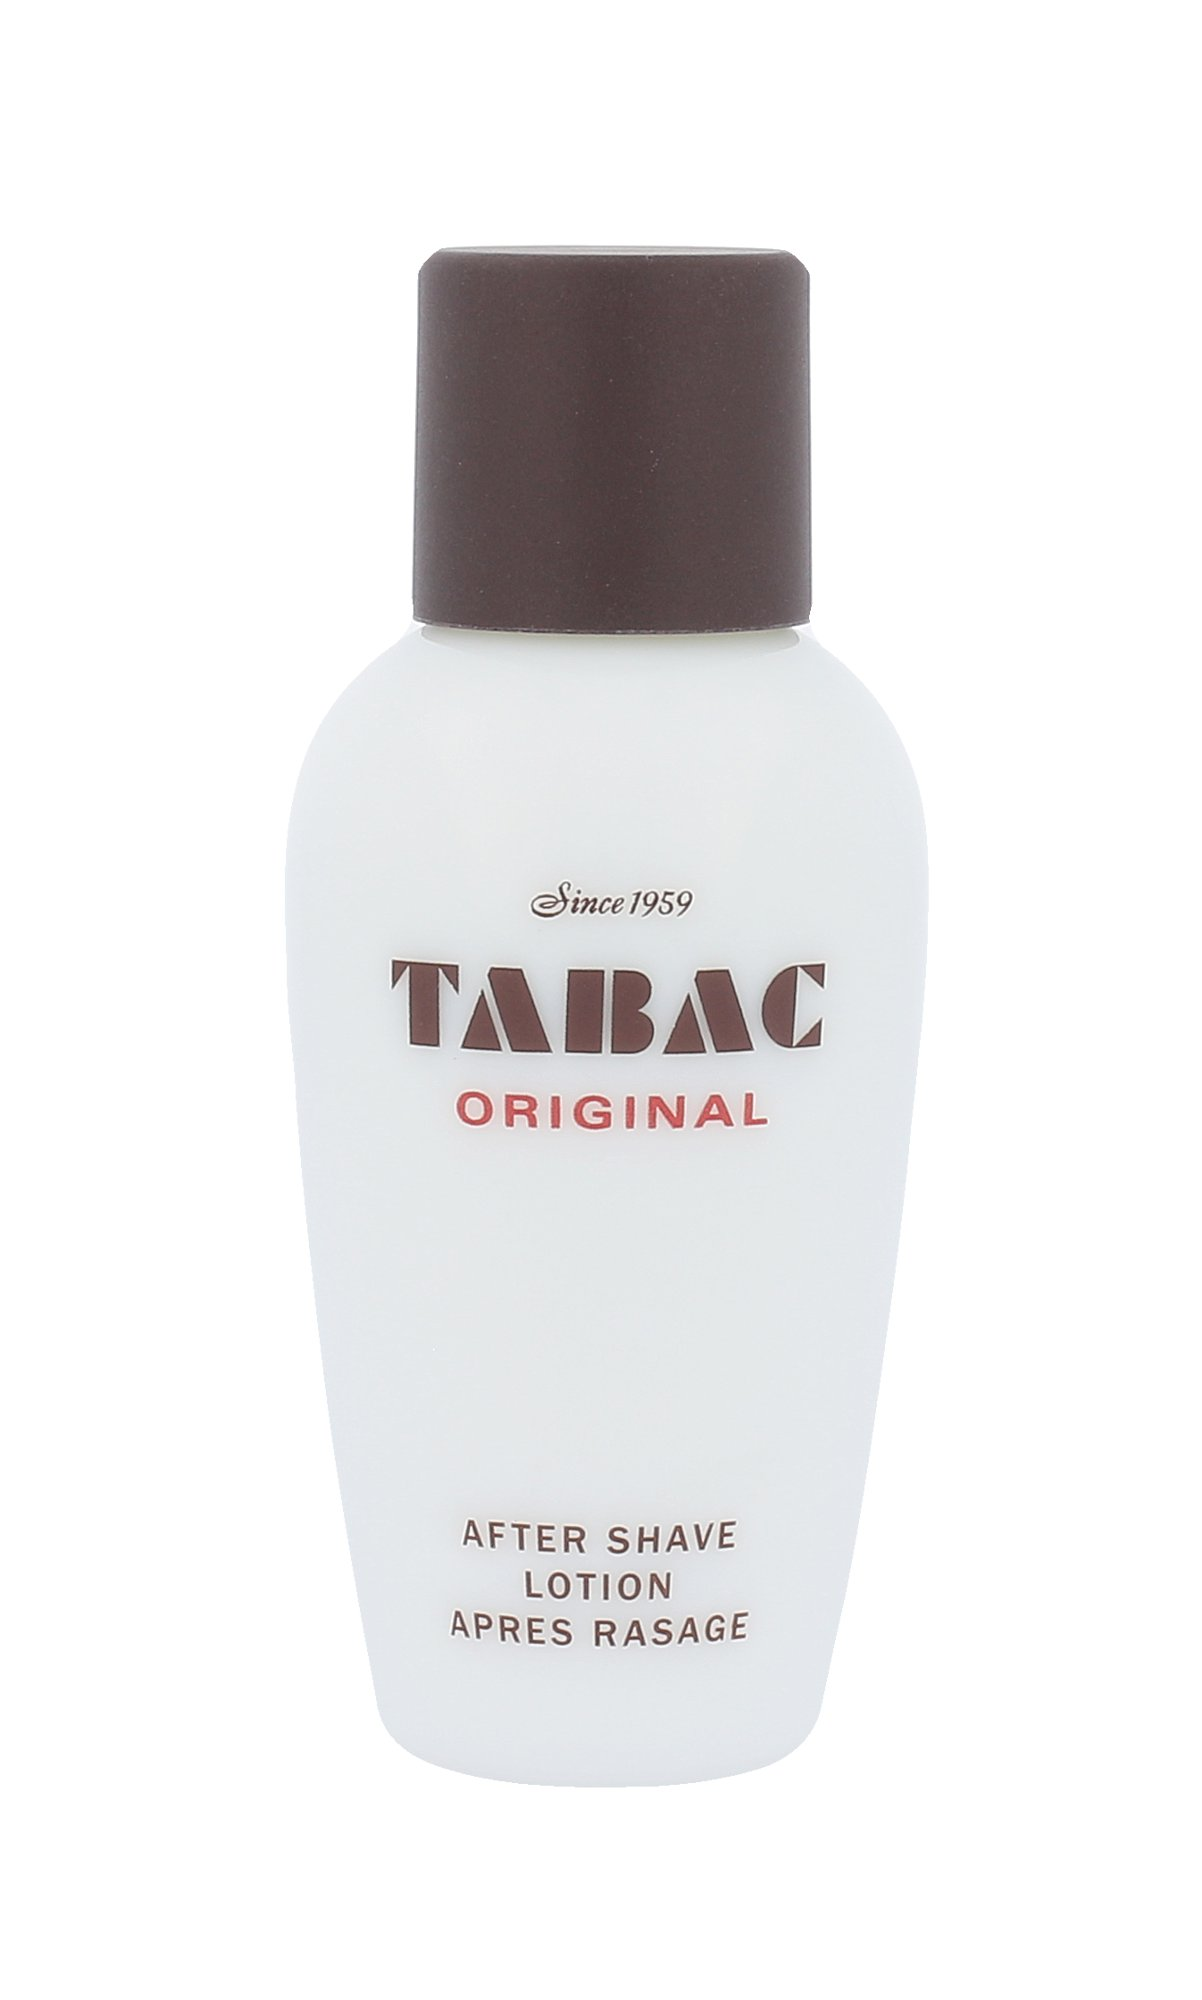 TABAC Original, after shave 100ml